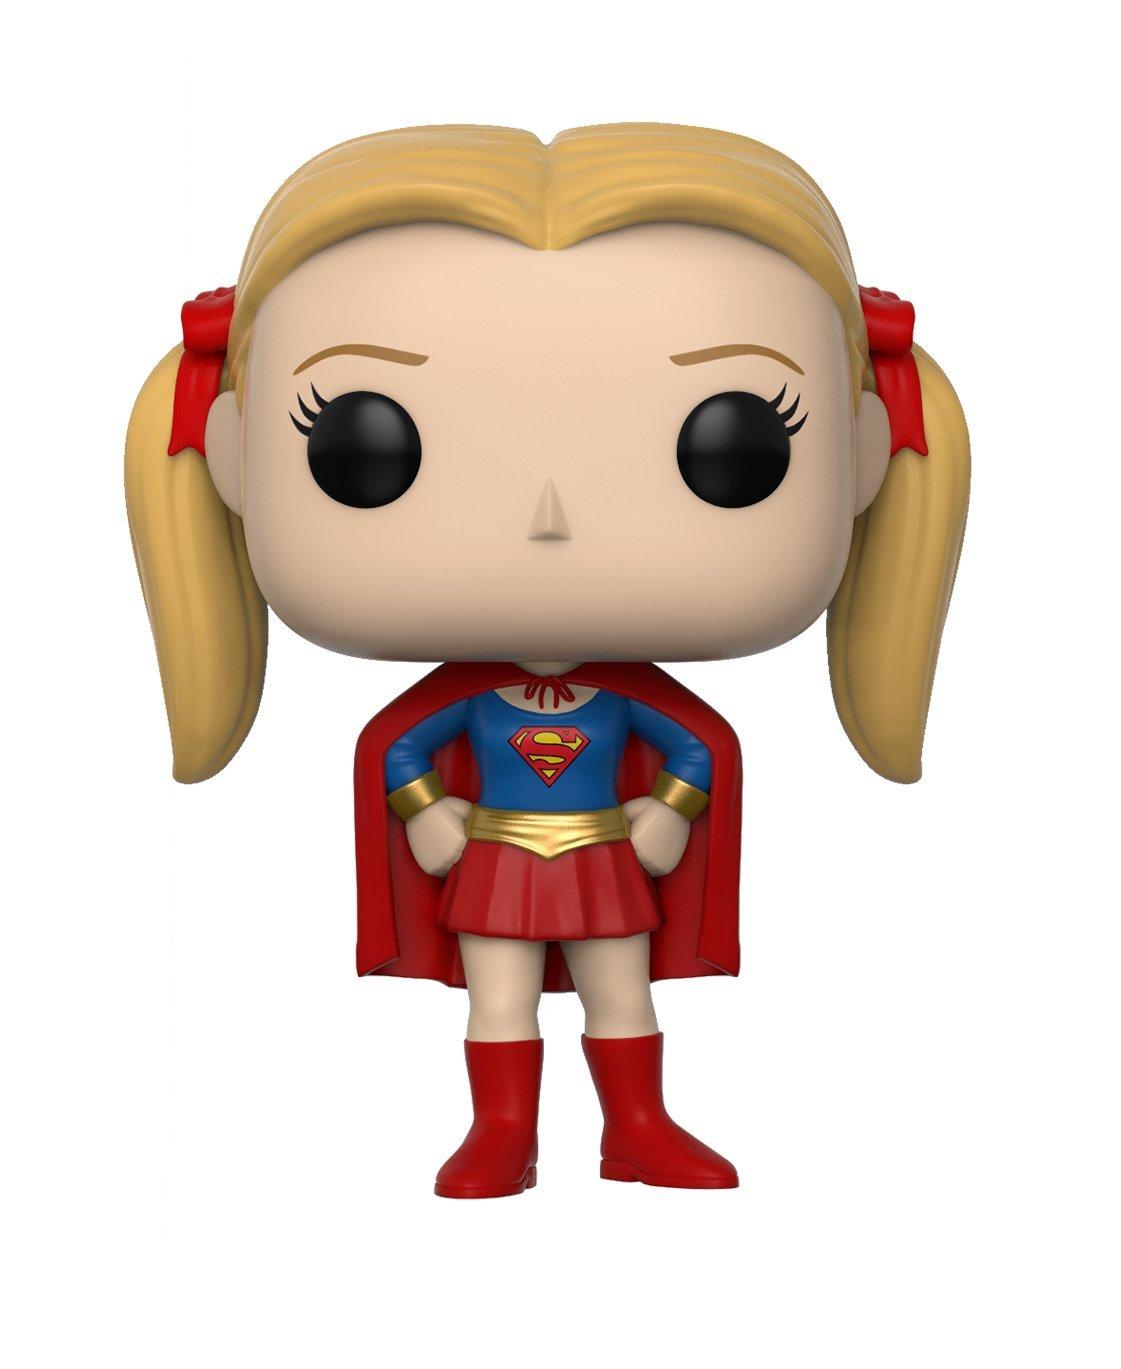 Funko Pop! Friends - Phoebe como Super Girl